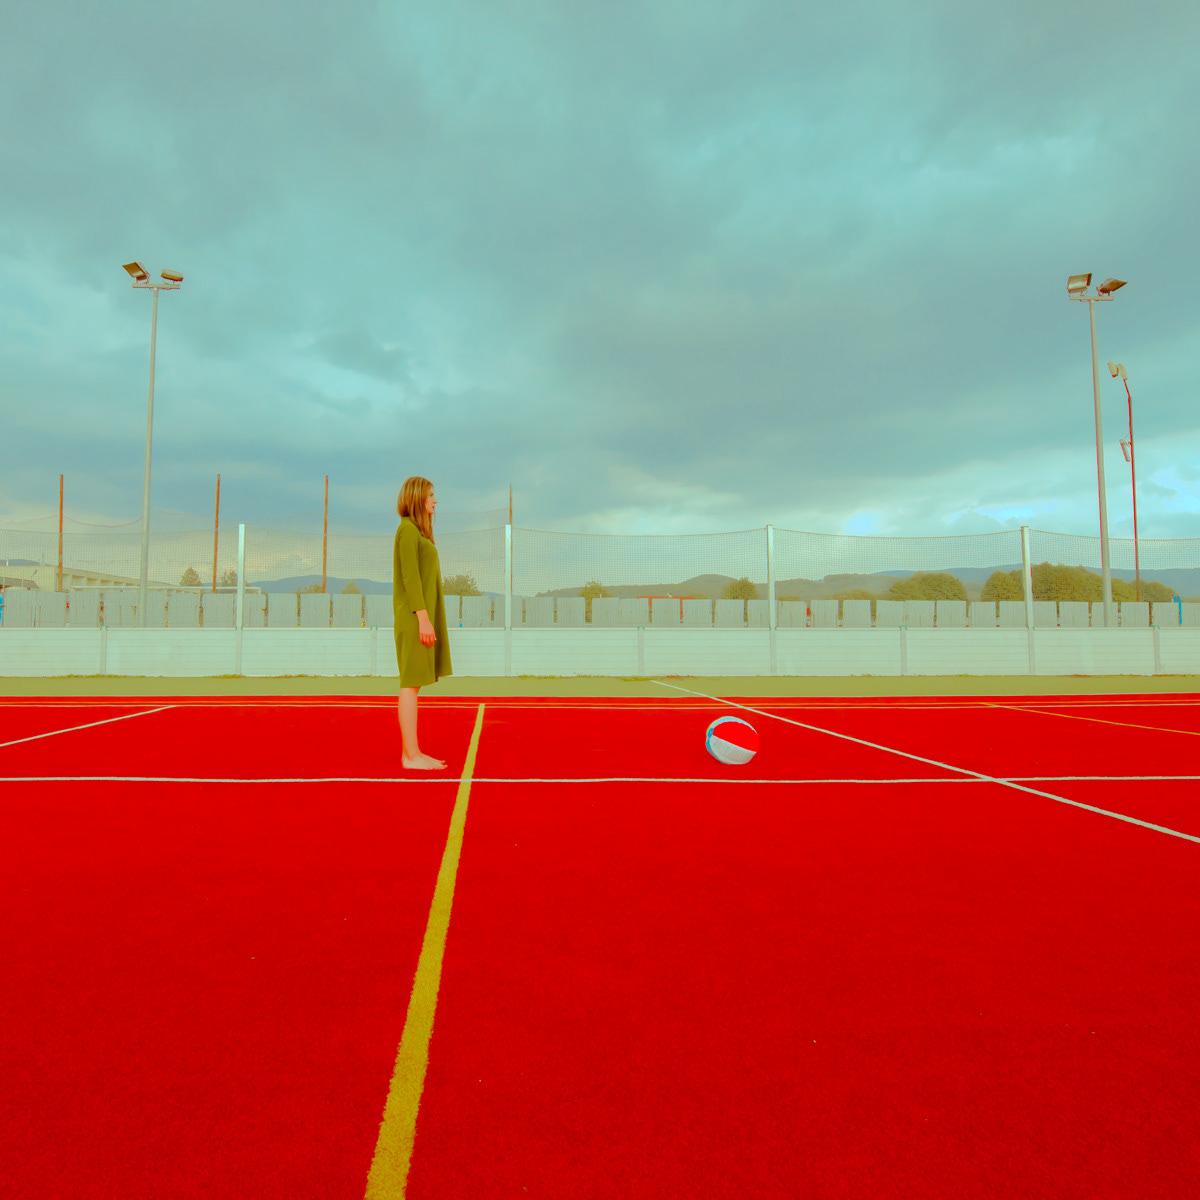 photo art Minimalism colors modern model red light